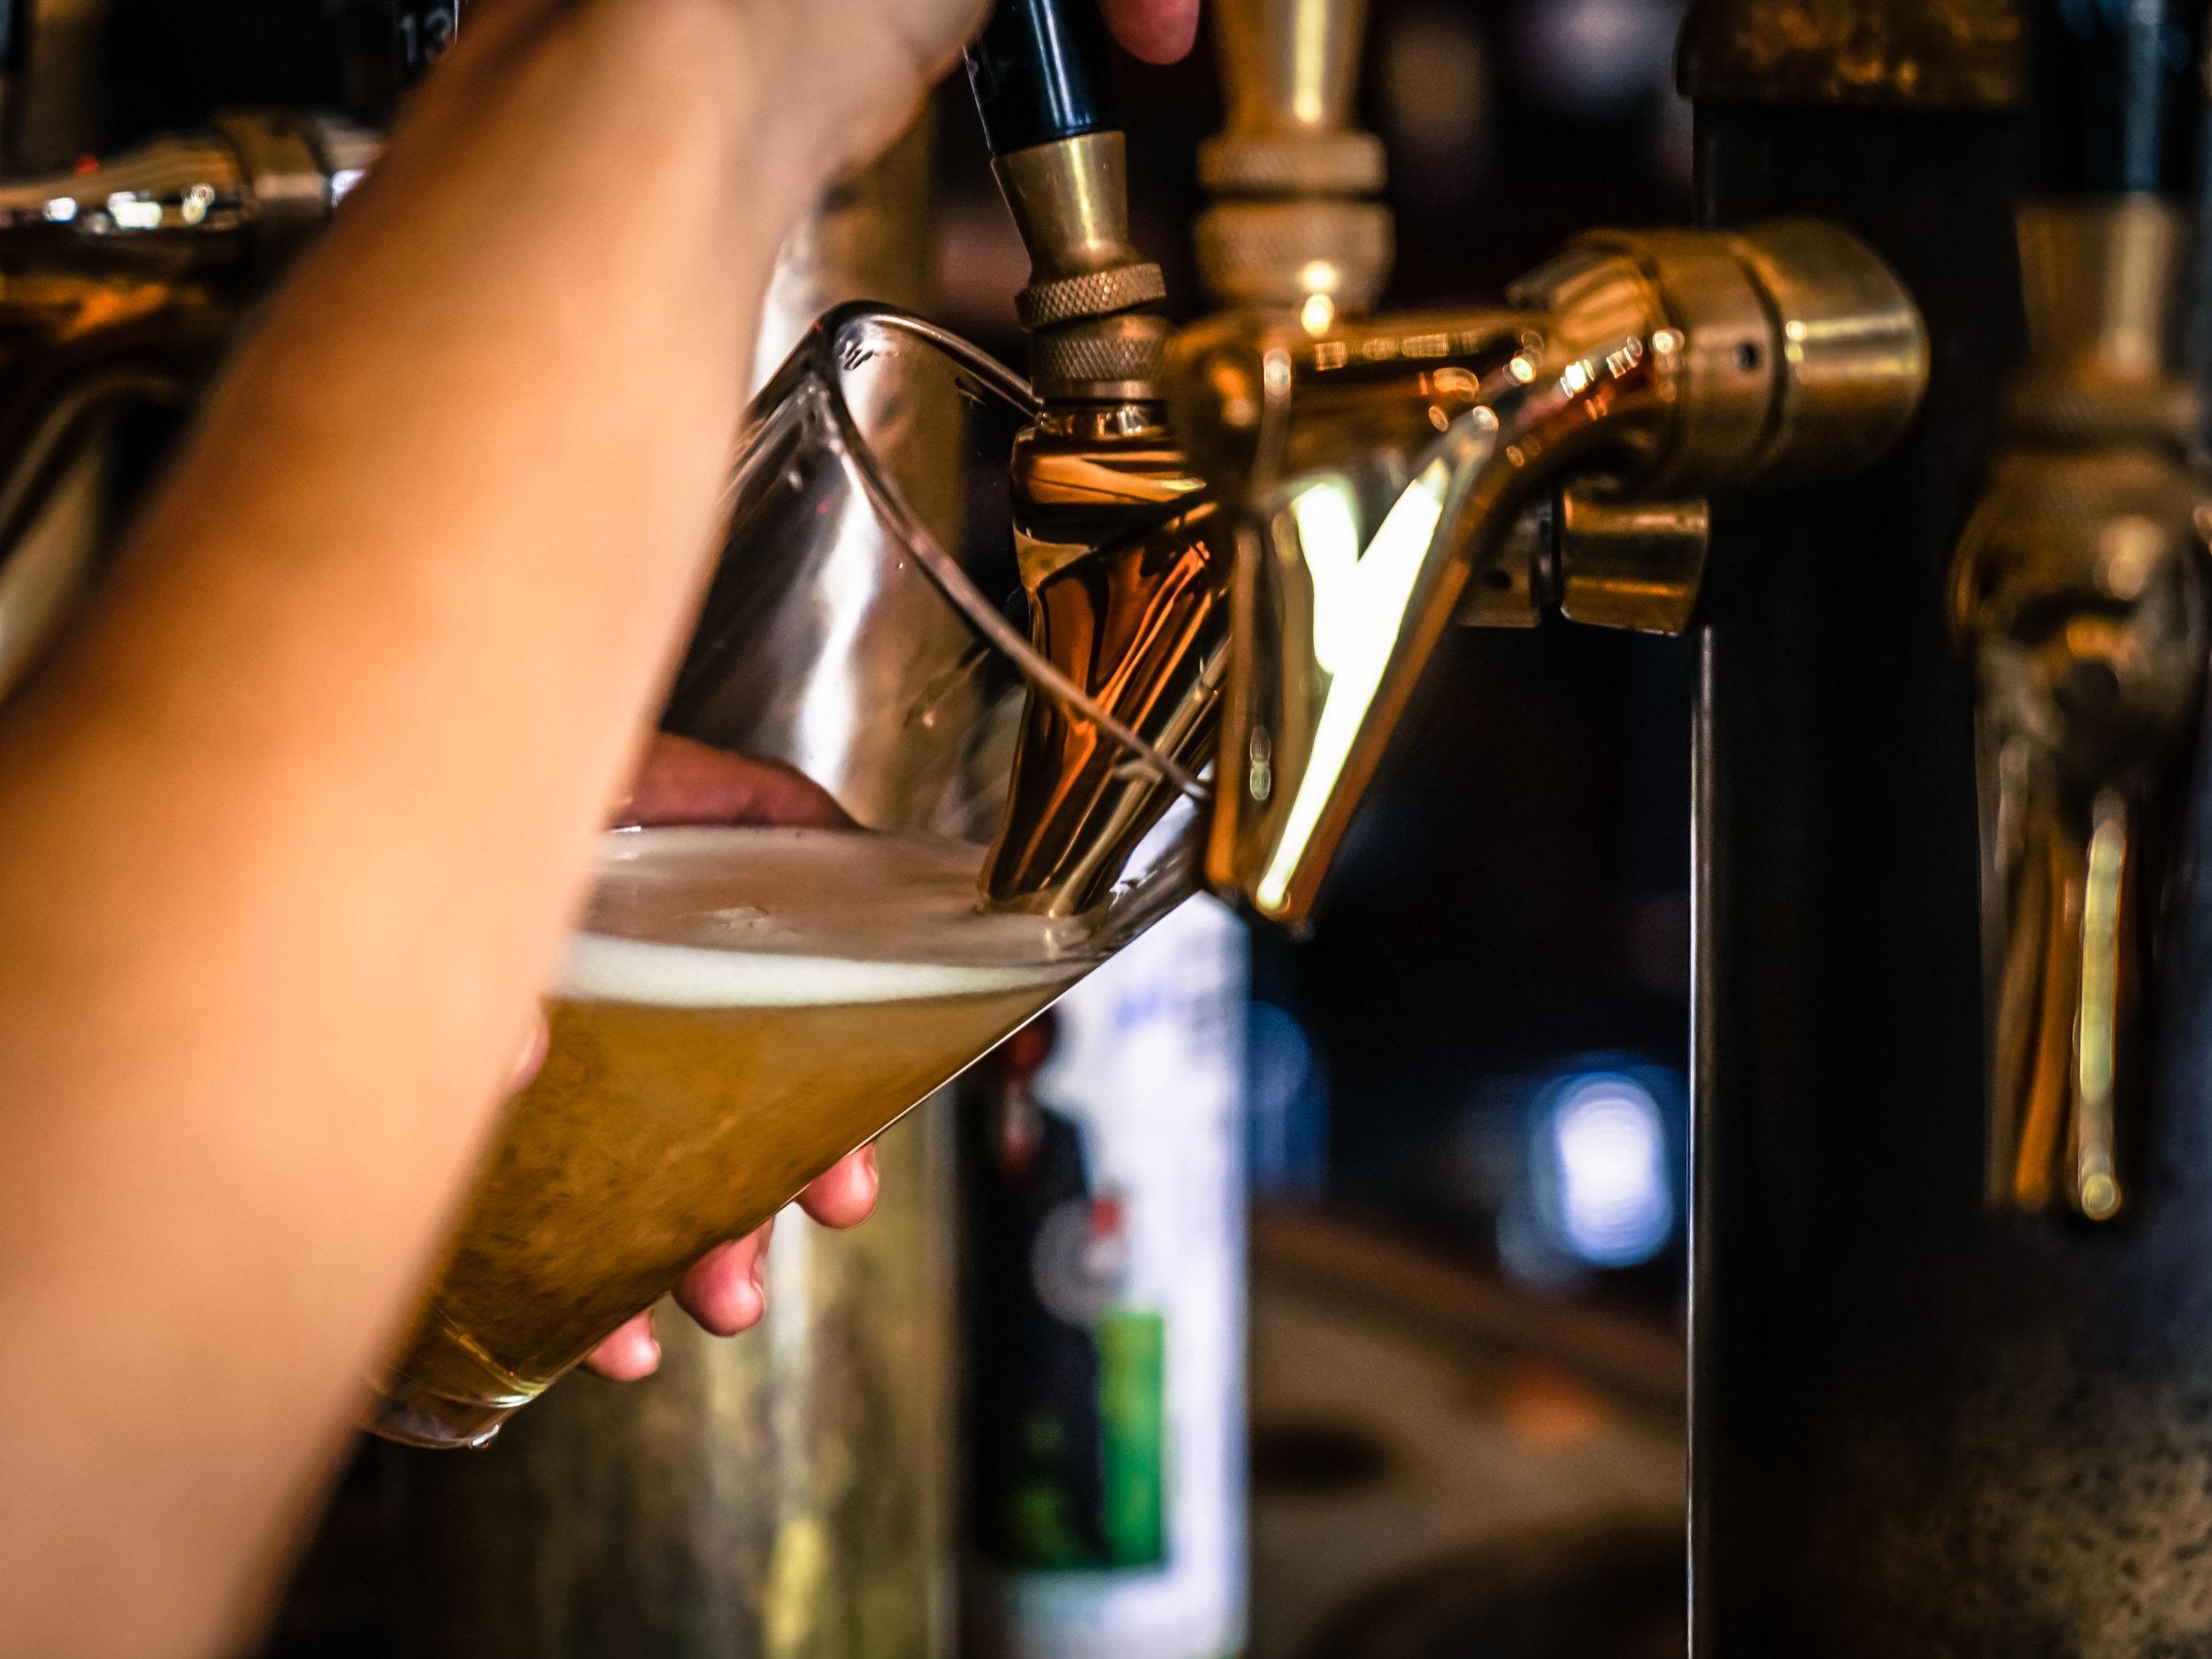 BeerPour.jpg